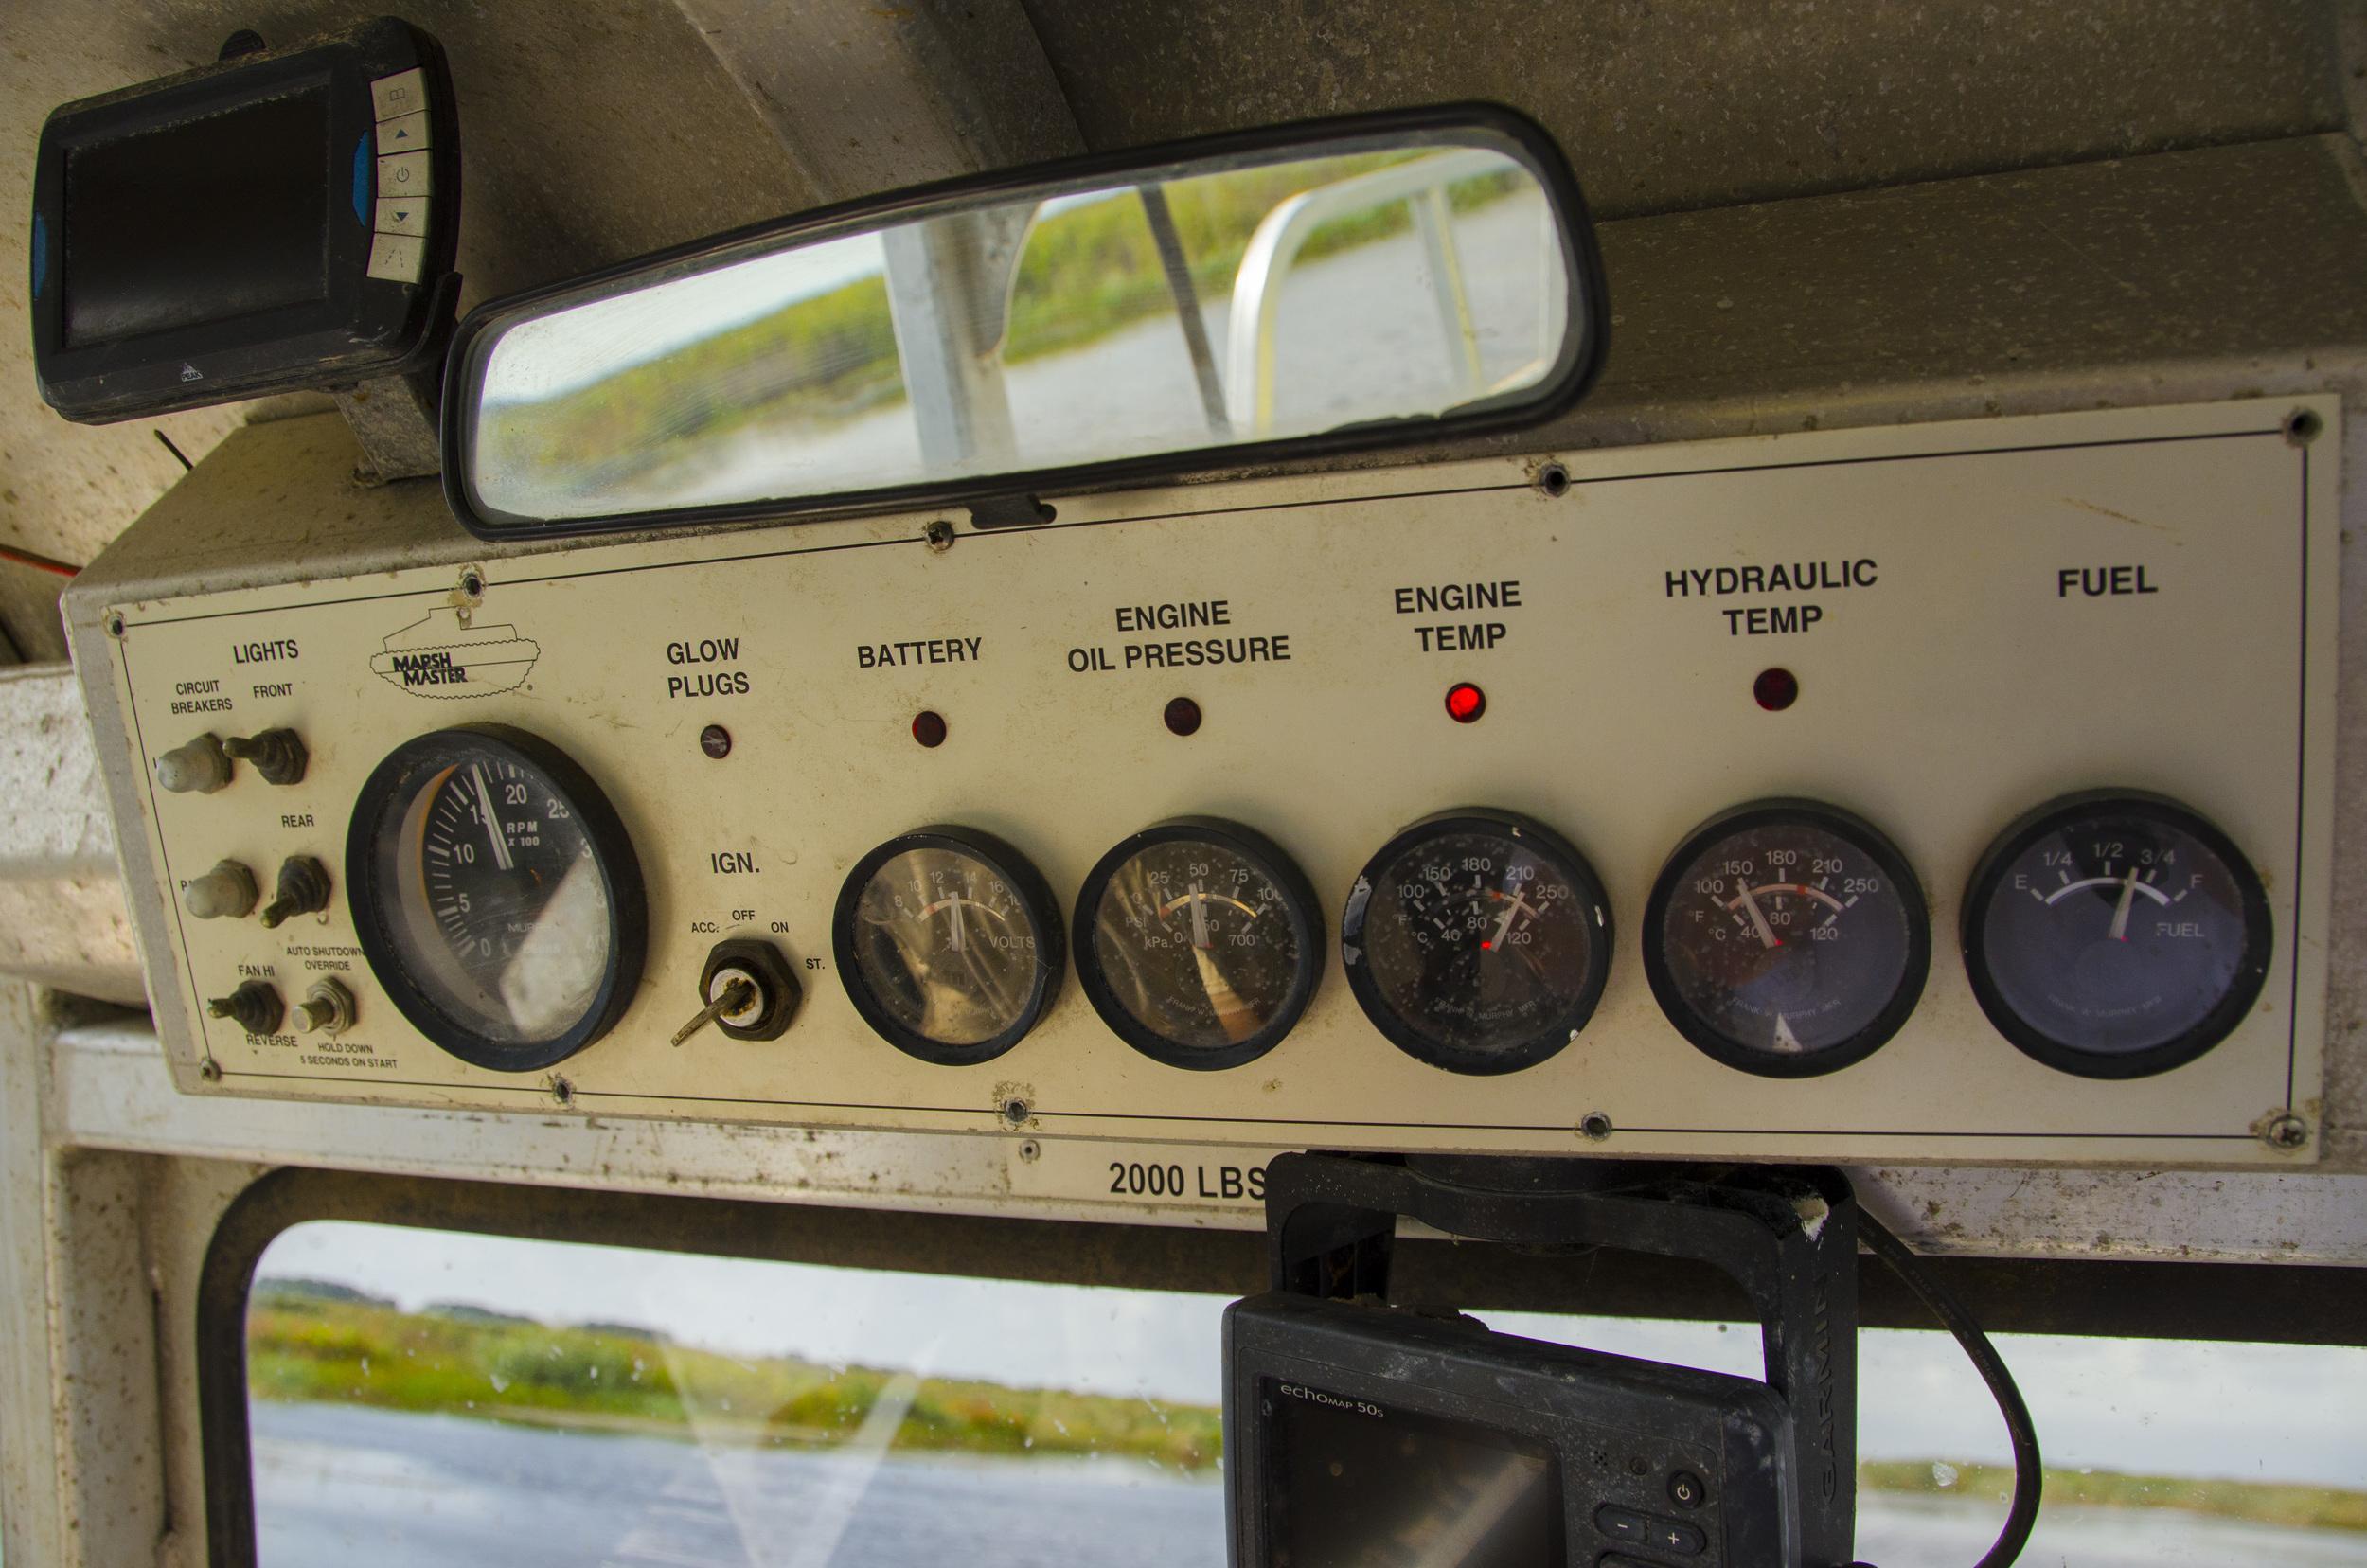 Dials and gauges